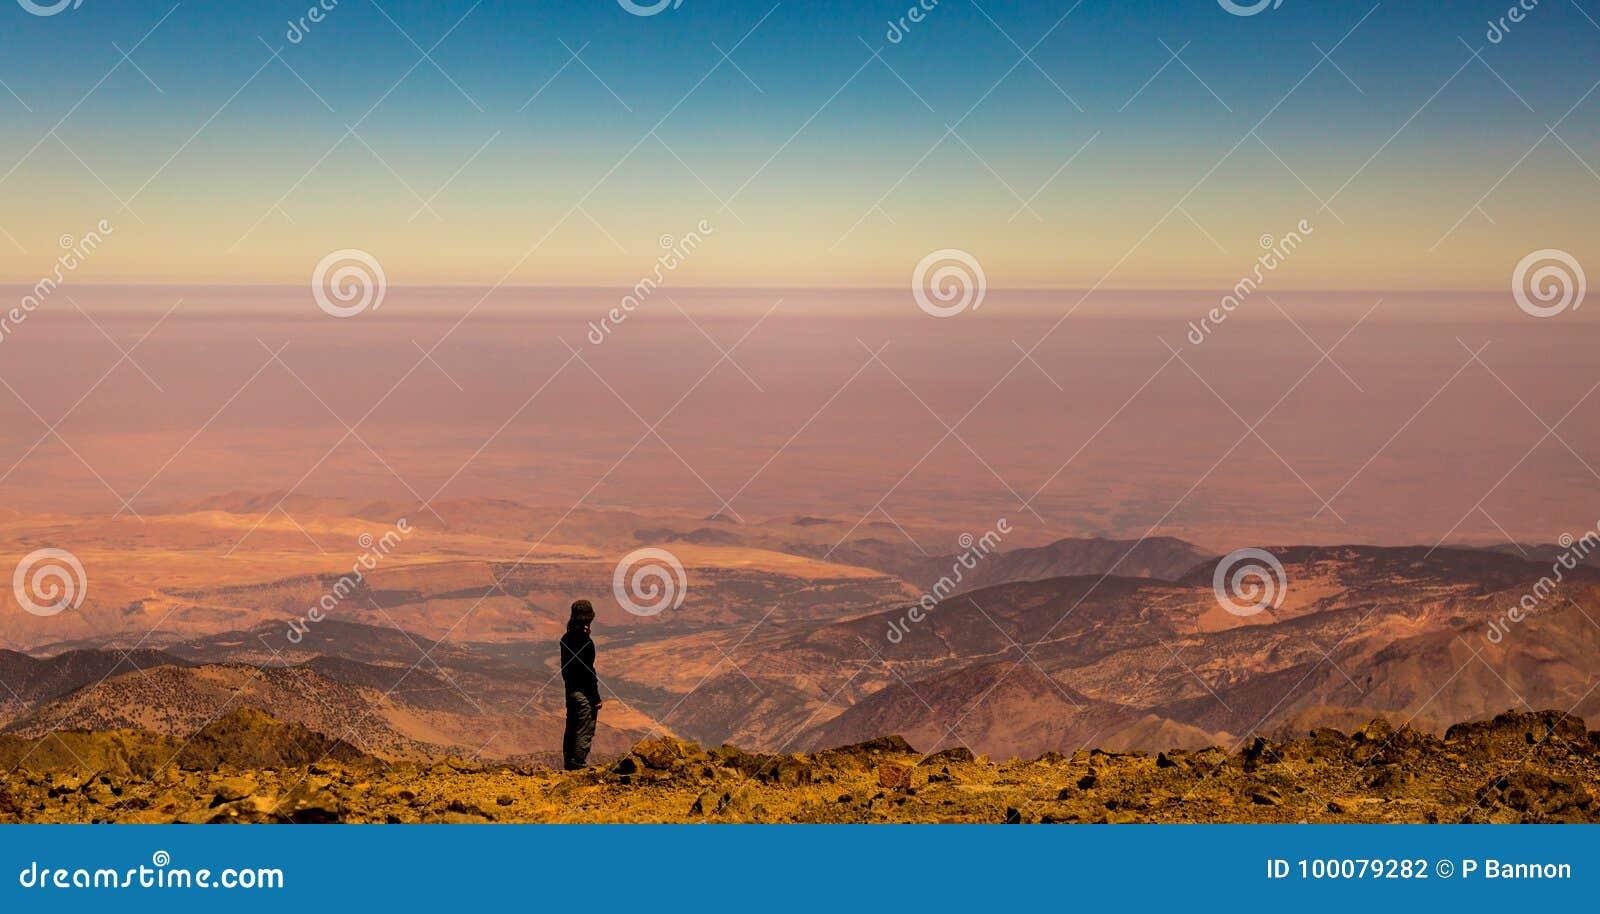 Den kvinnliga trekkeren tycker om sikten från toppmötet av Jbel Toubkal, kartbokberg, Marocko